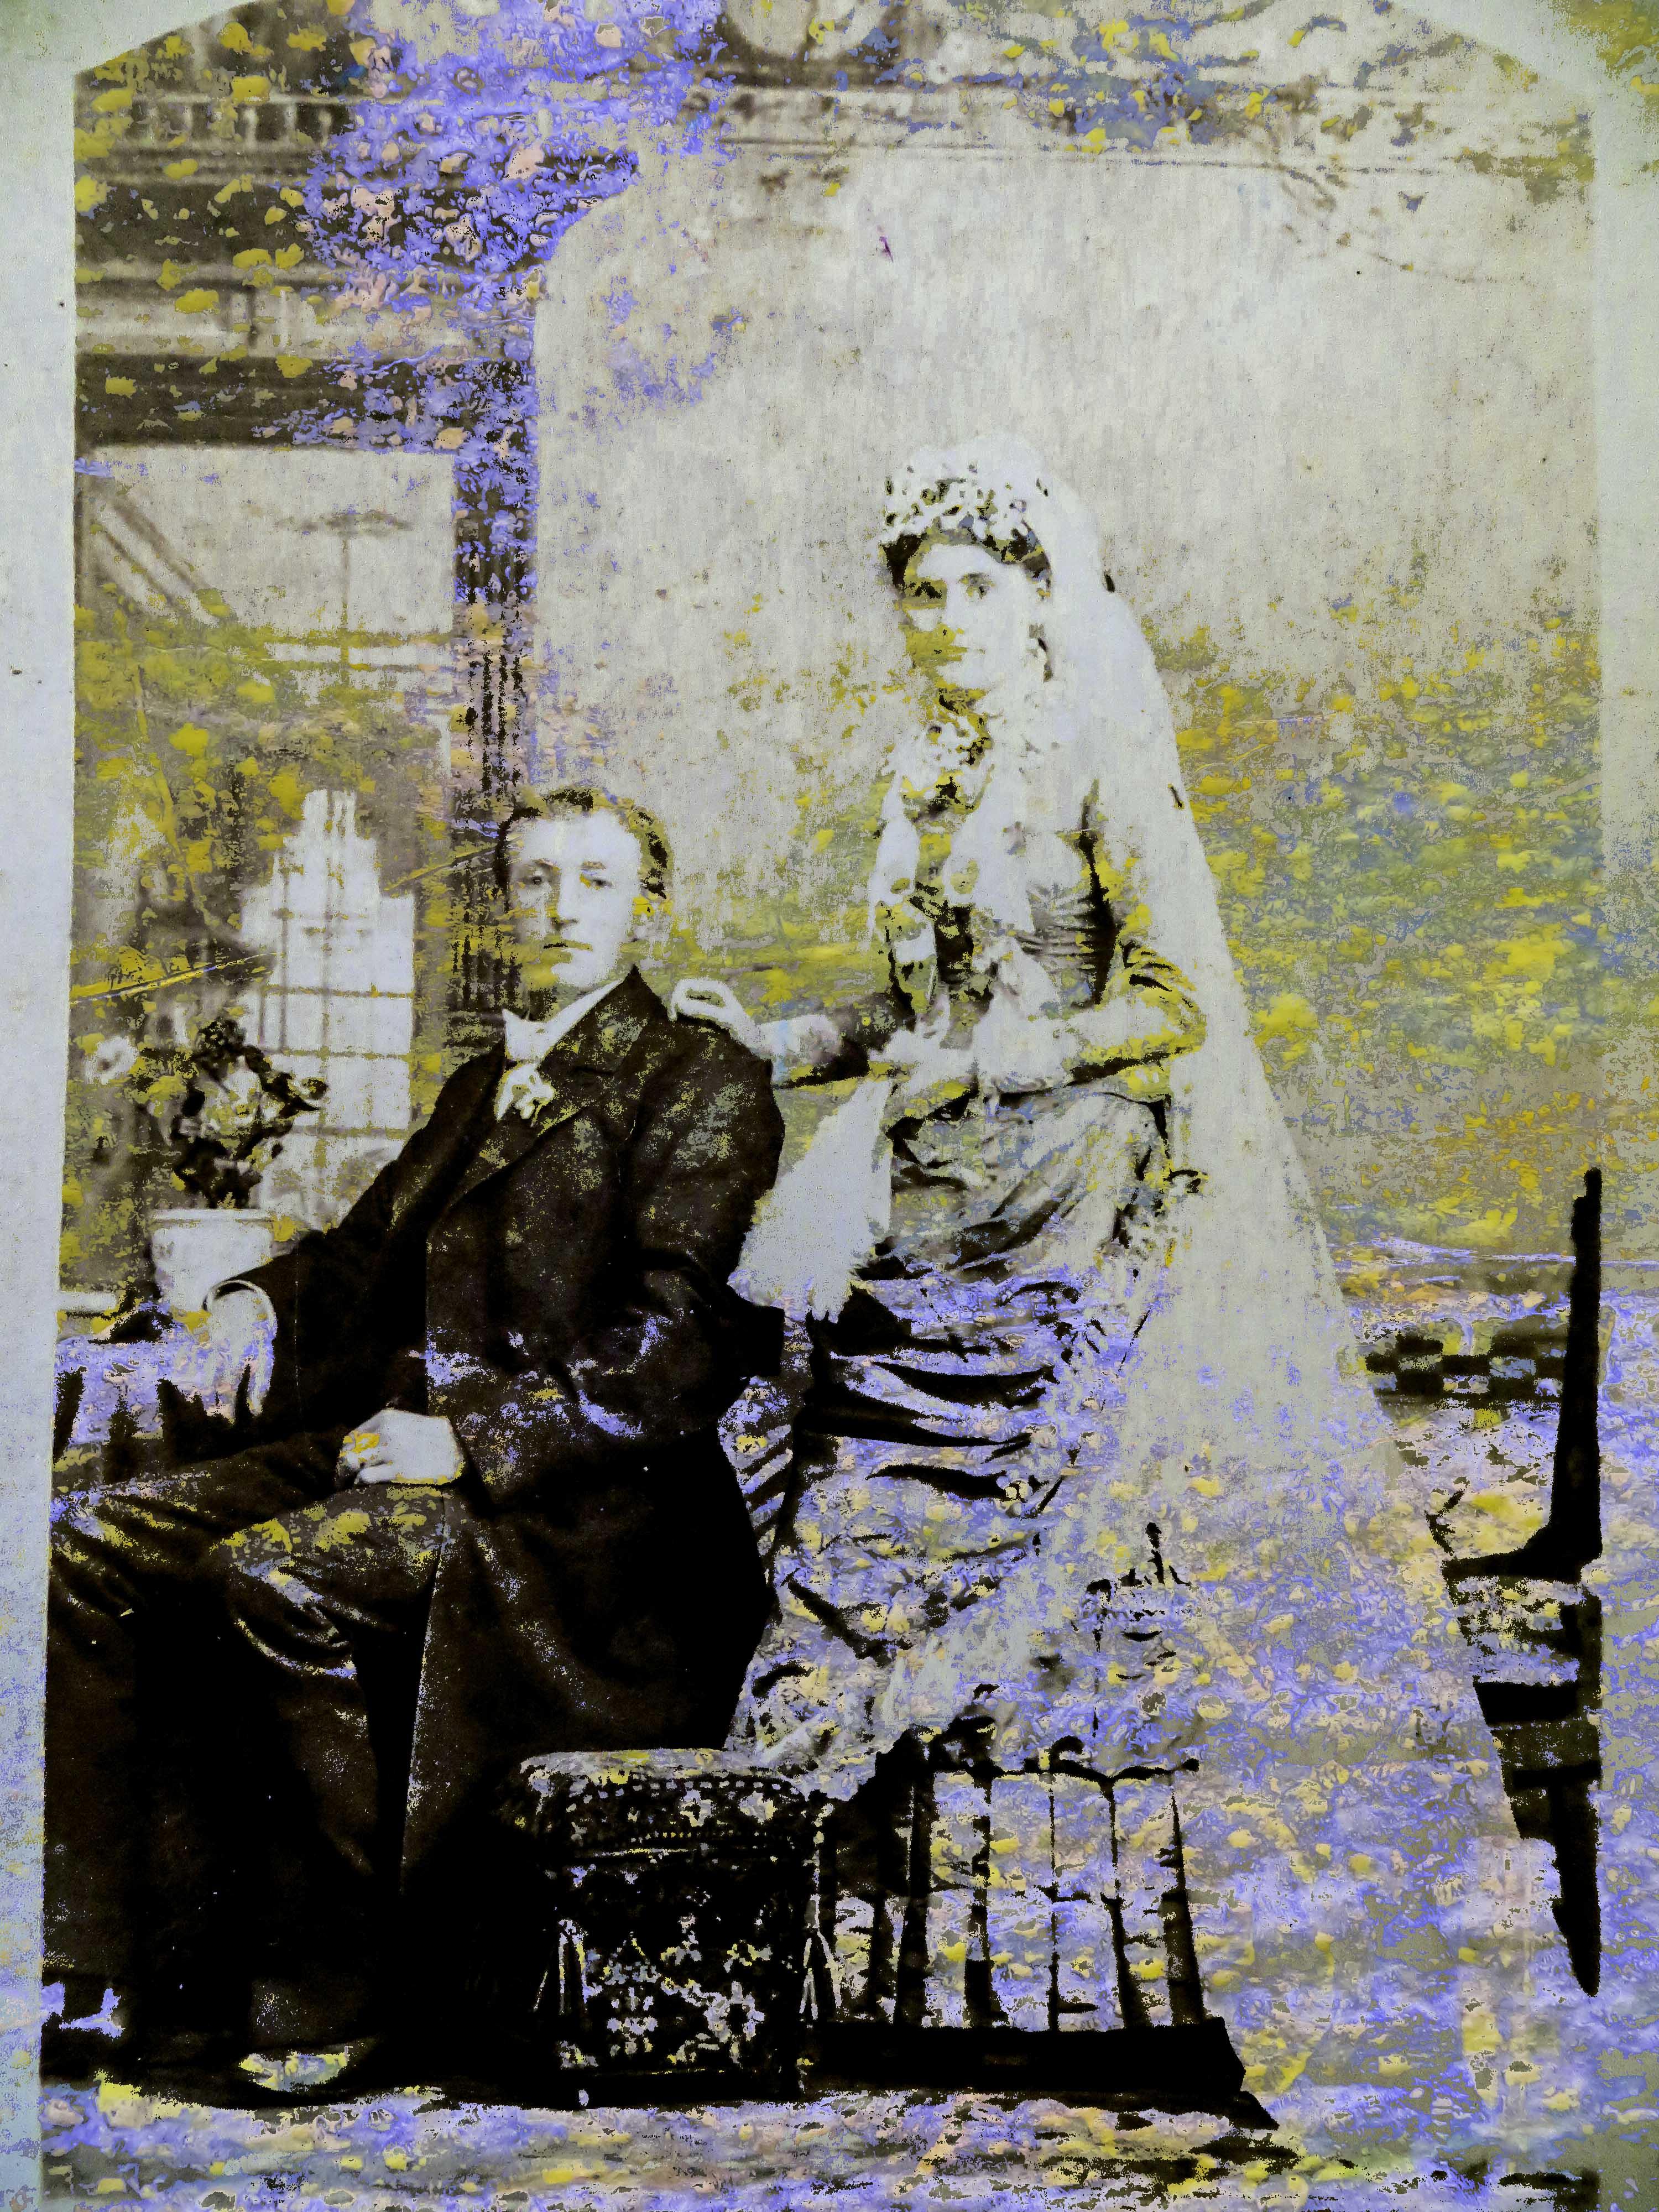 Marriage Photo FLW 1111 grrde